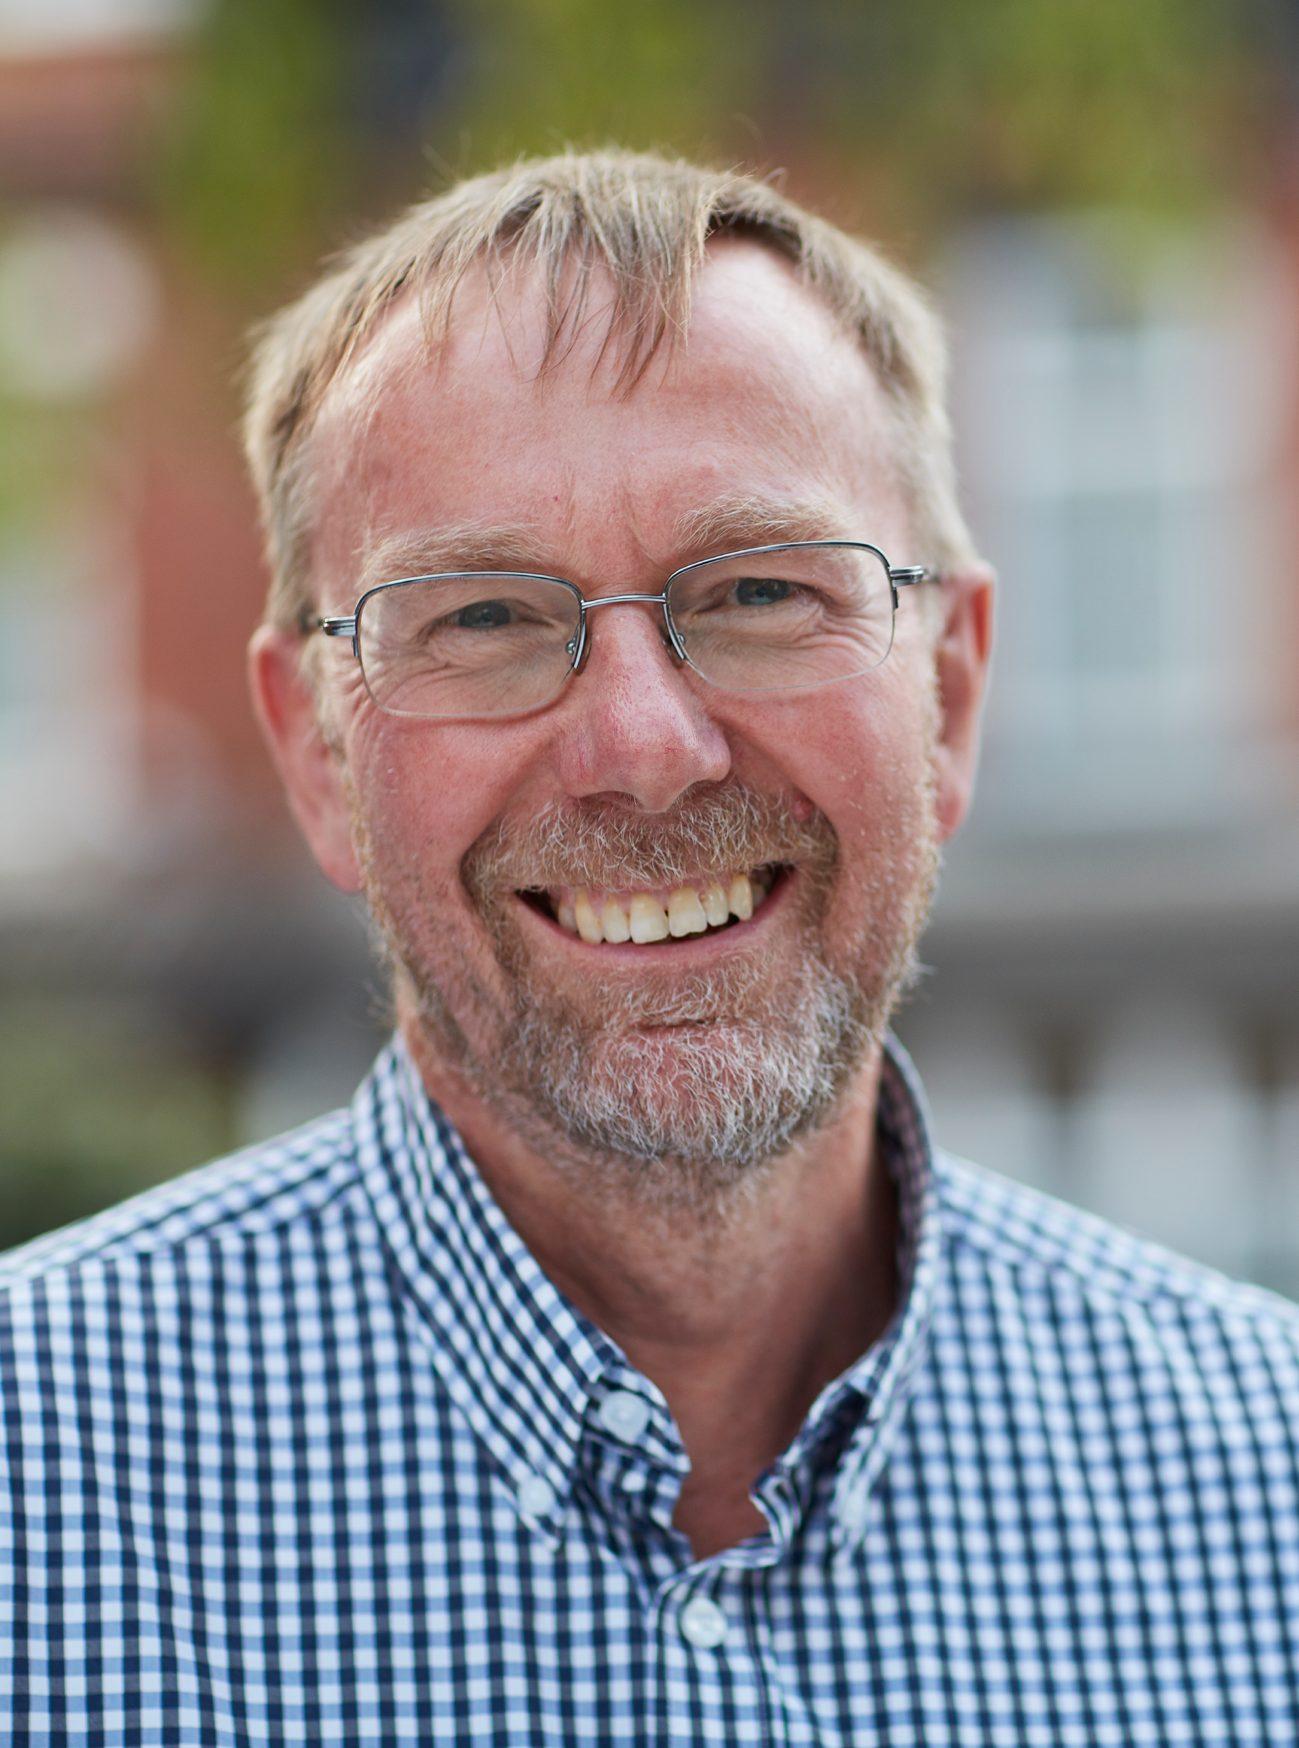 David Wilmhurst